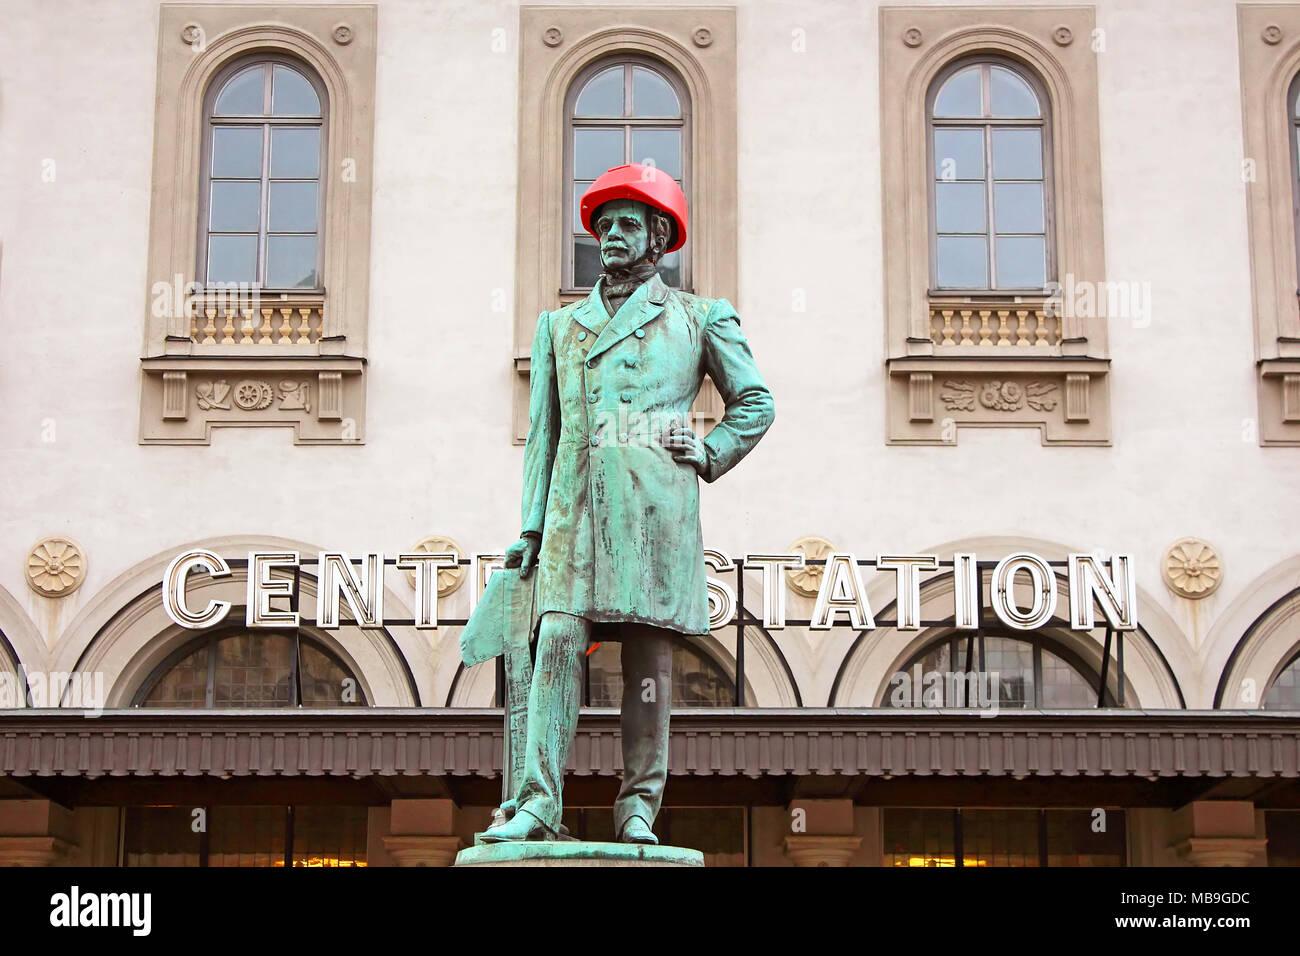 STOCKHOLM, Schweden - 17. OKTOBER 2013: Satue von Nils Ericson vor dem Bahnhof in Stockholm. Stockbild